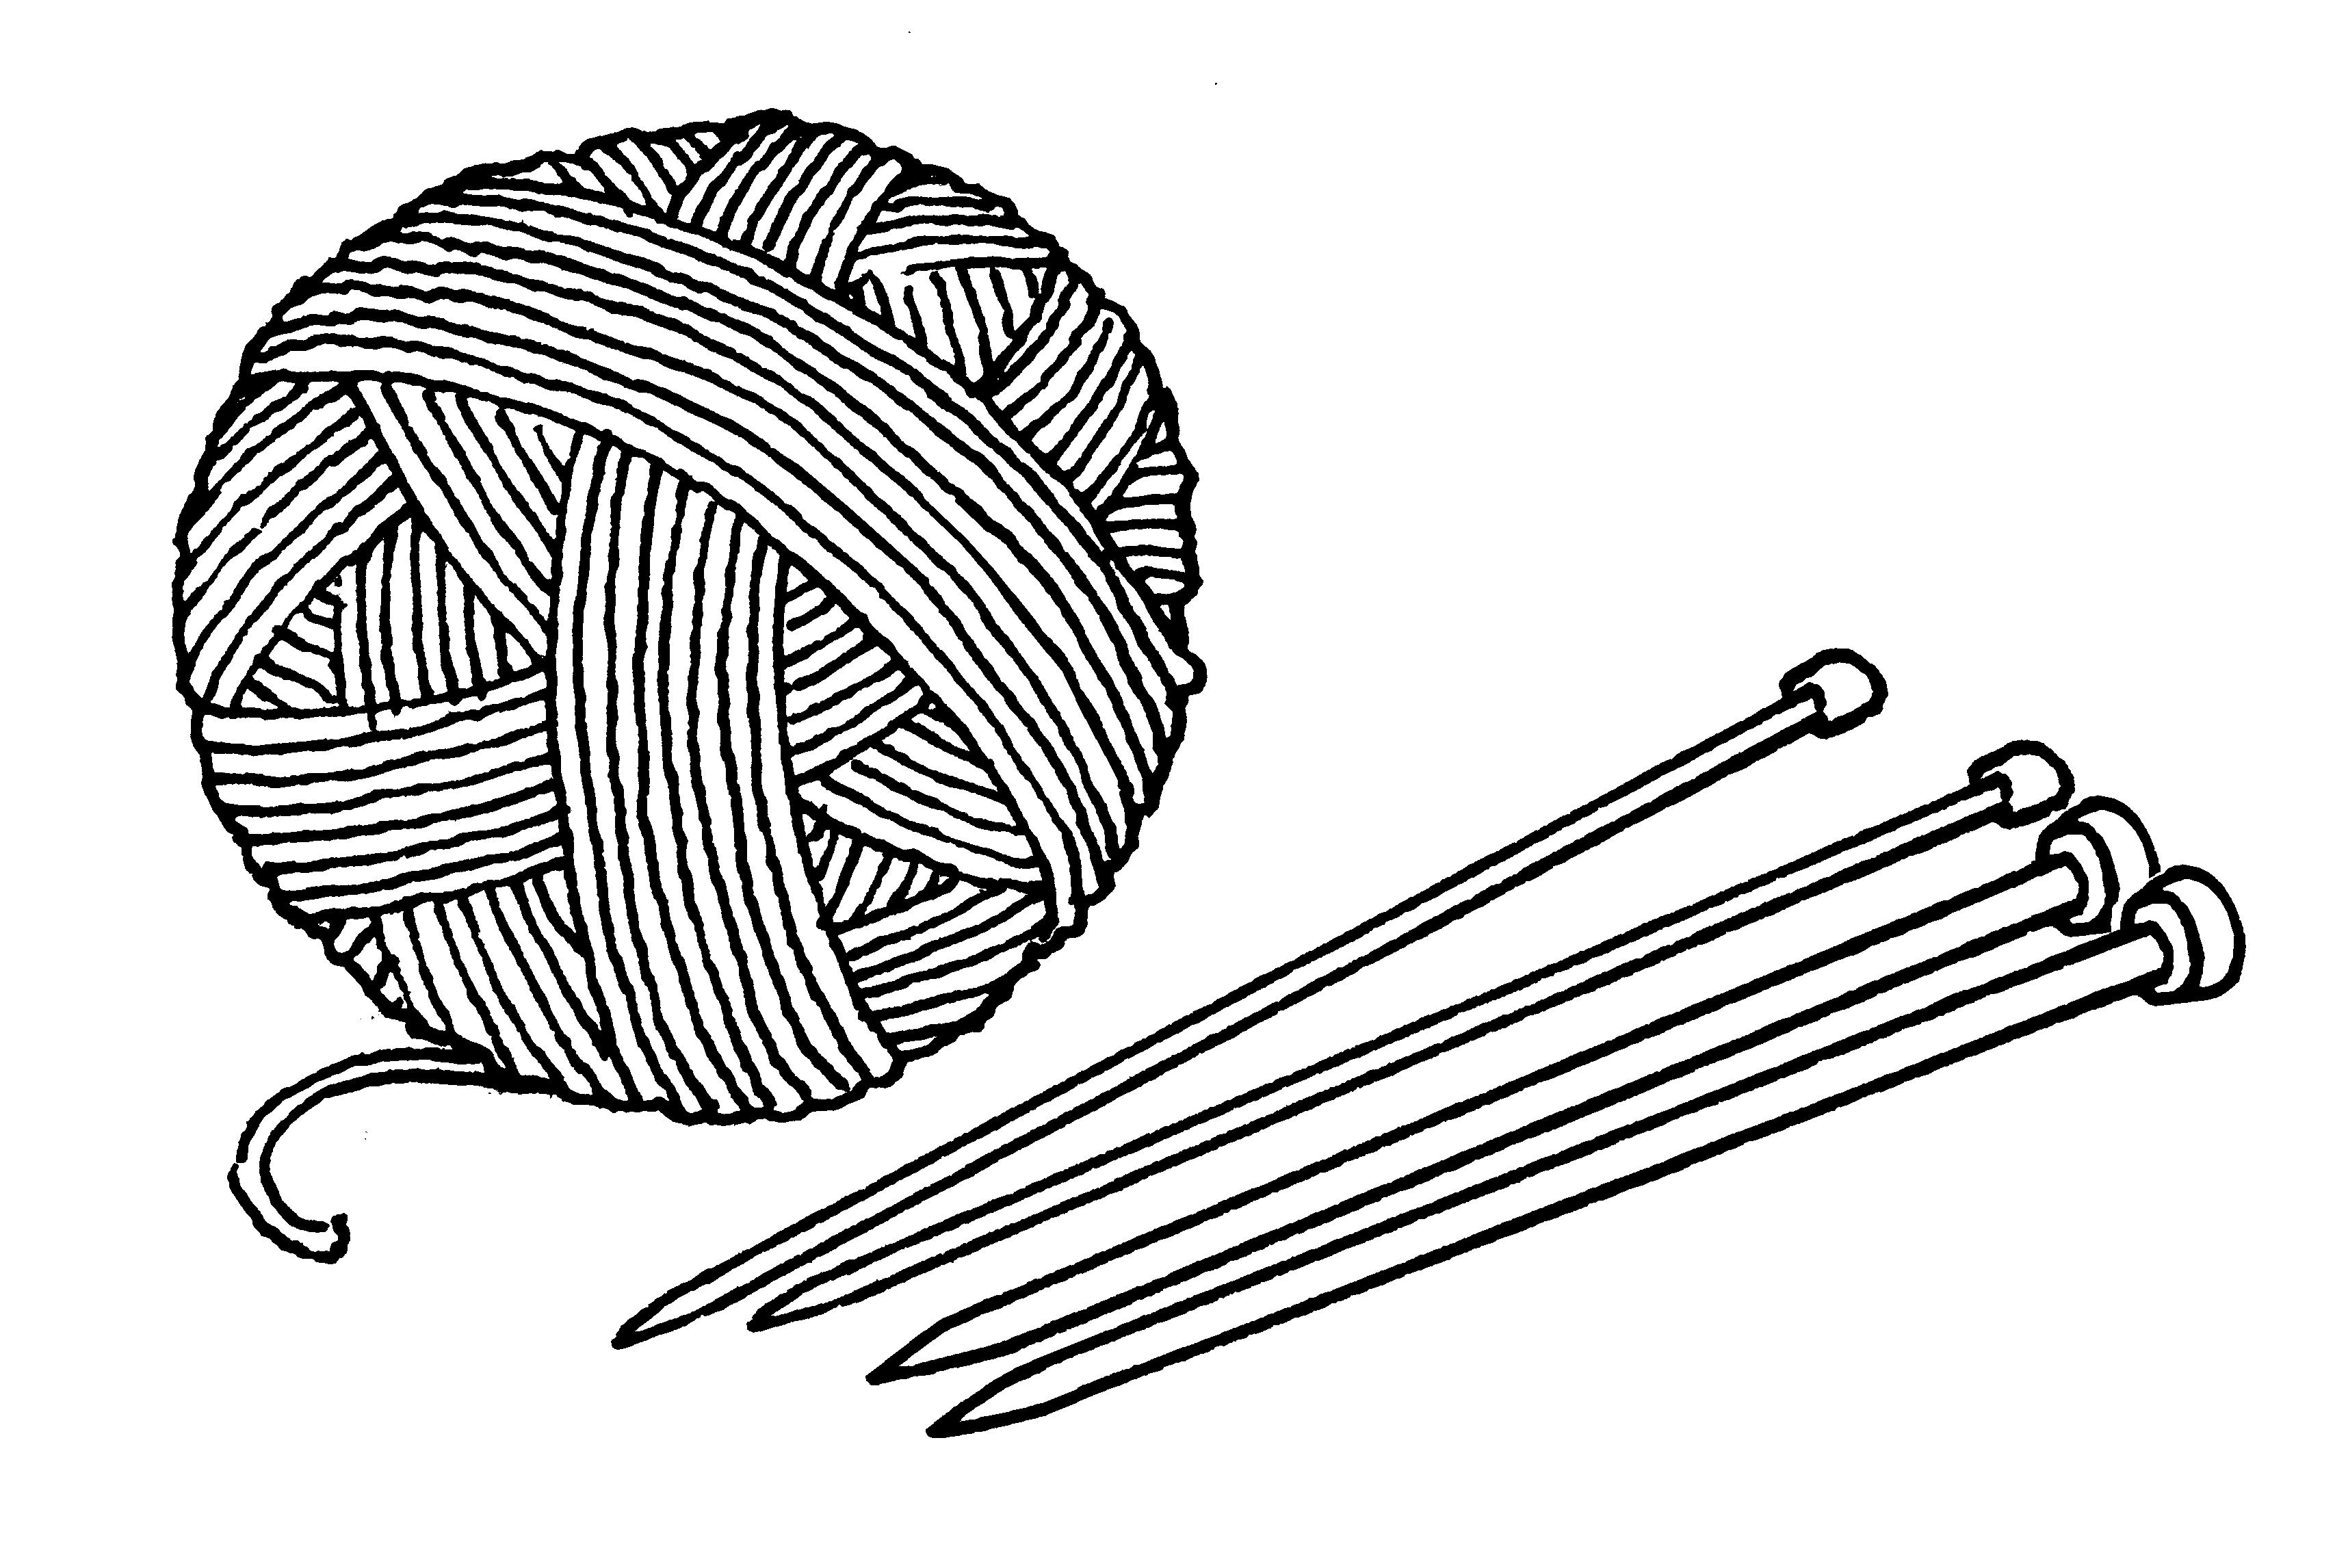 3432x2292 Png Yarn And Knitting Needles Transparent Yarn And Knitting